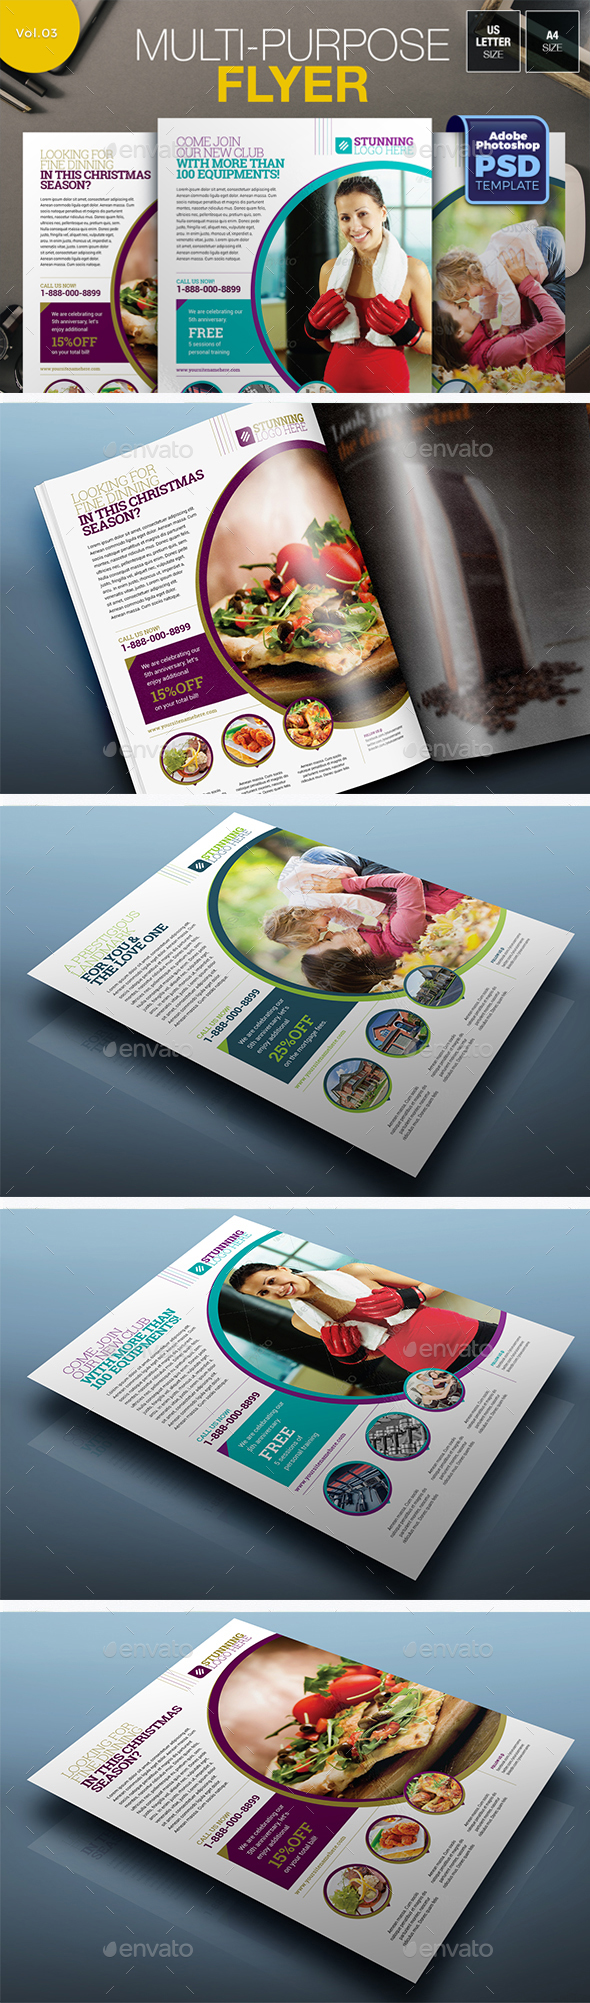 Multipurpose Flyer Vol.03 - Miscellaneous Events